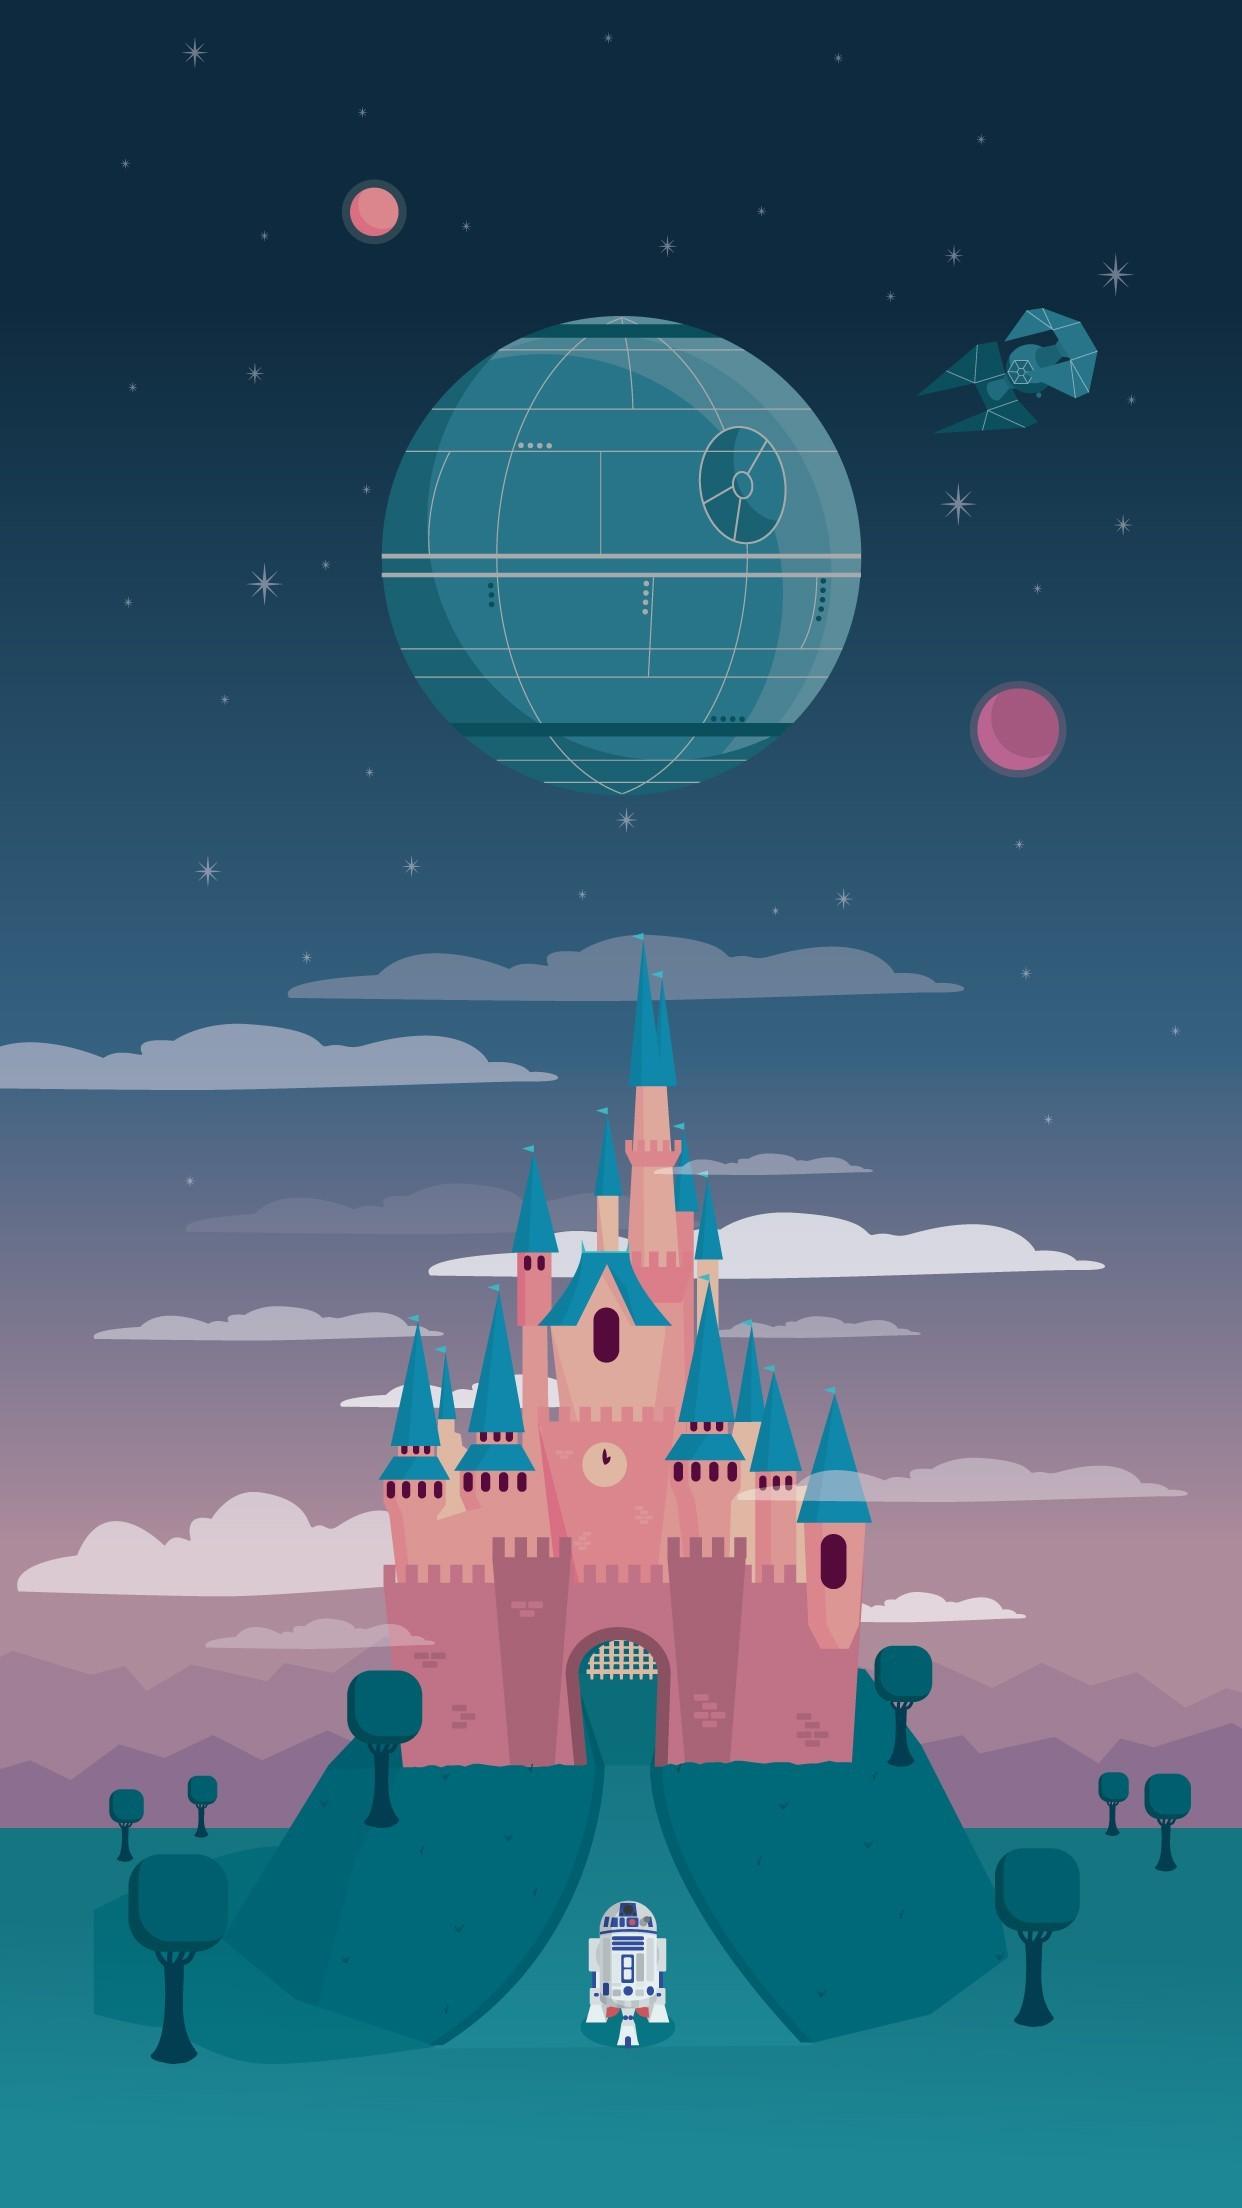 Milli-Jane – Disney and the Death Star